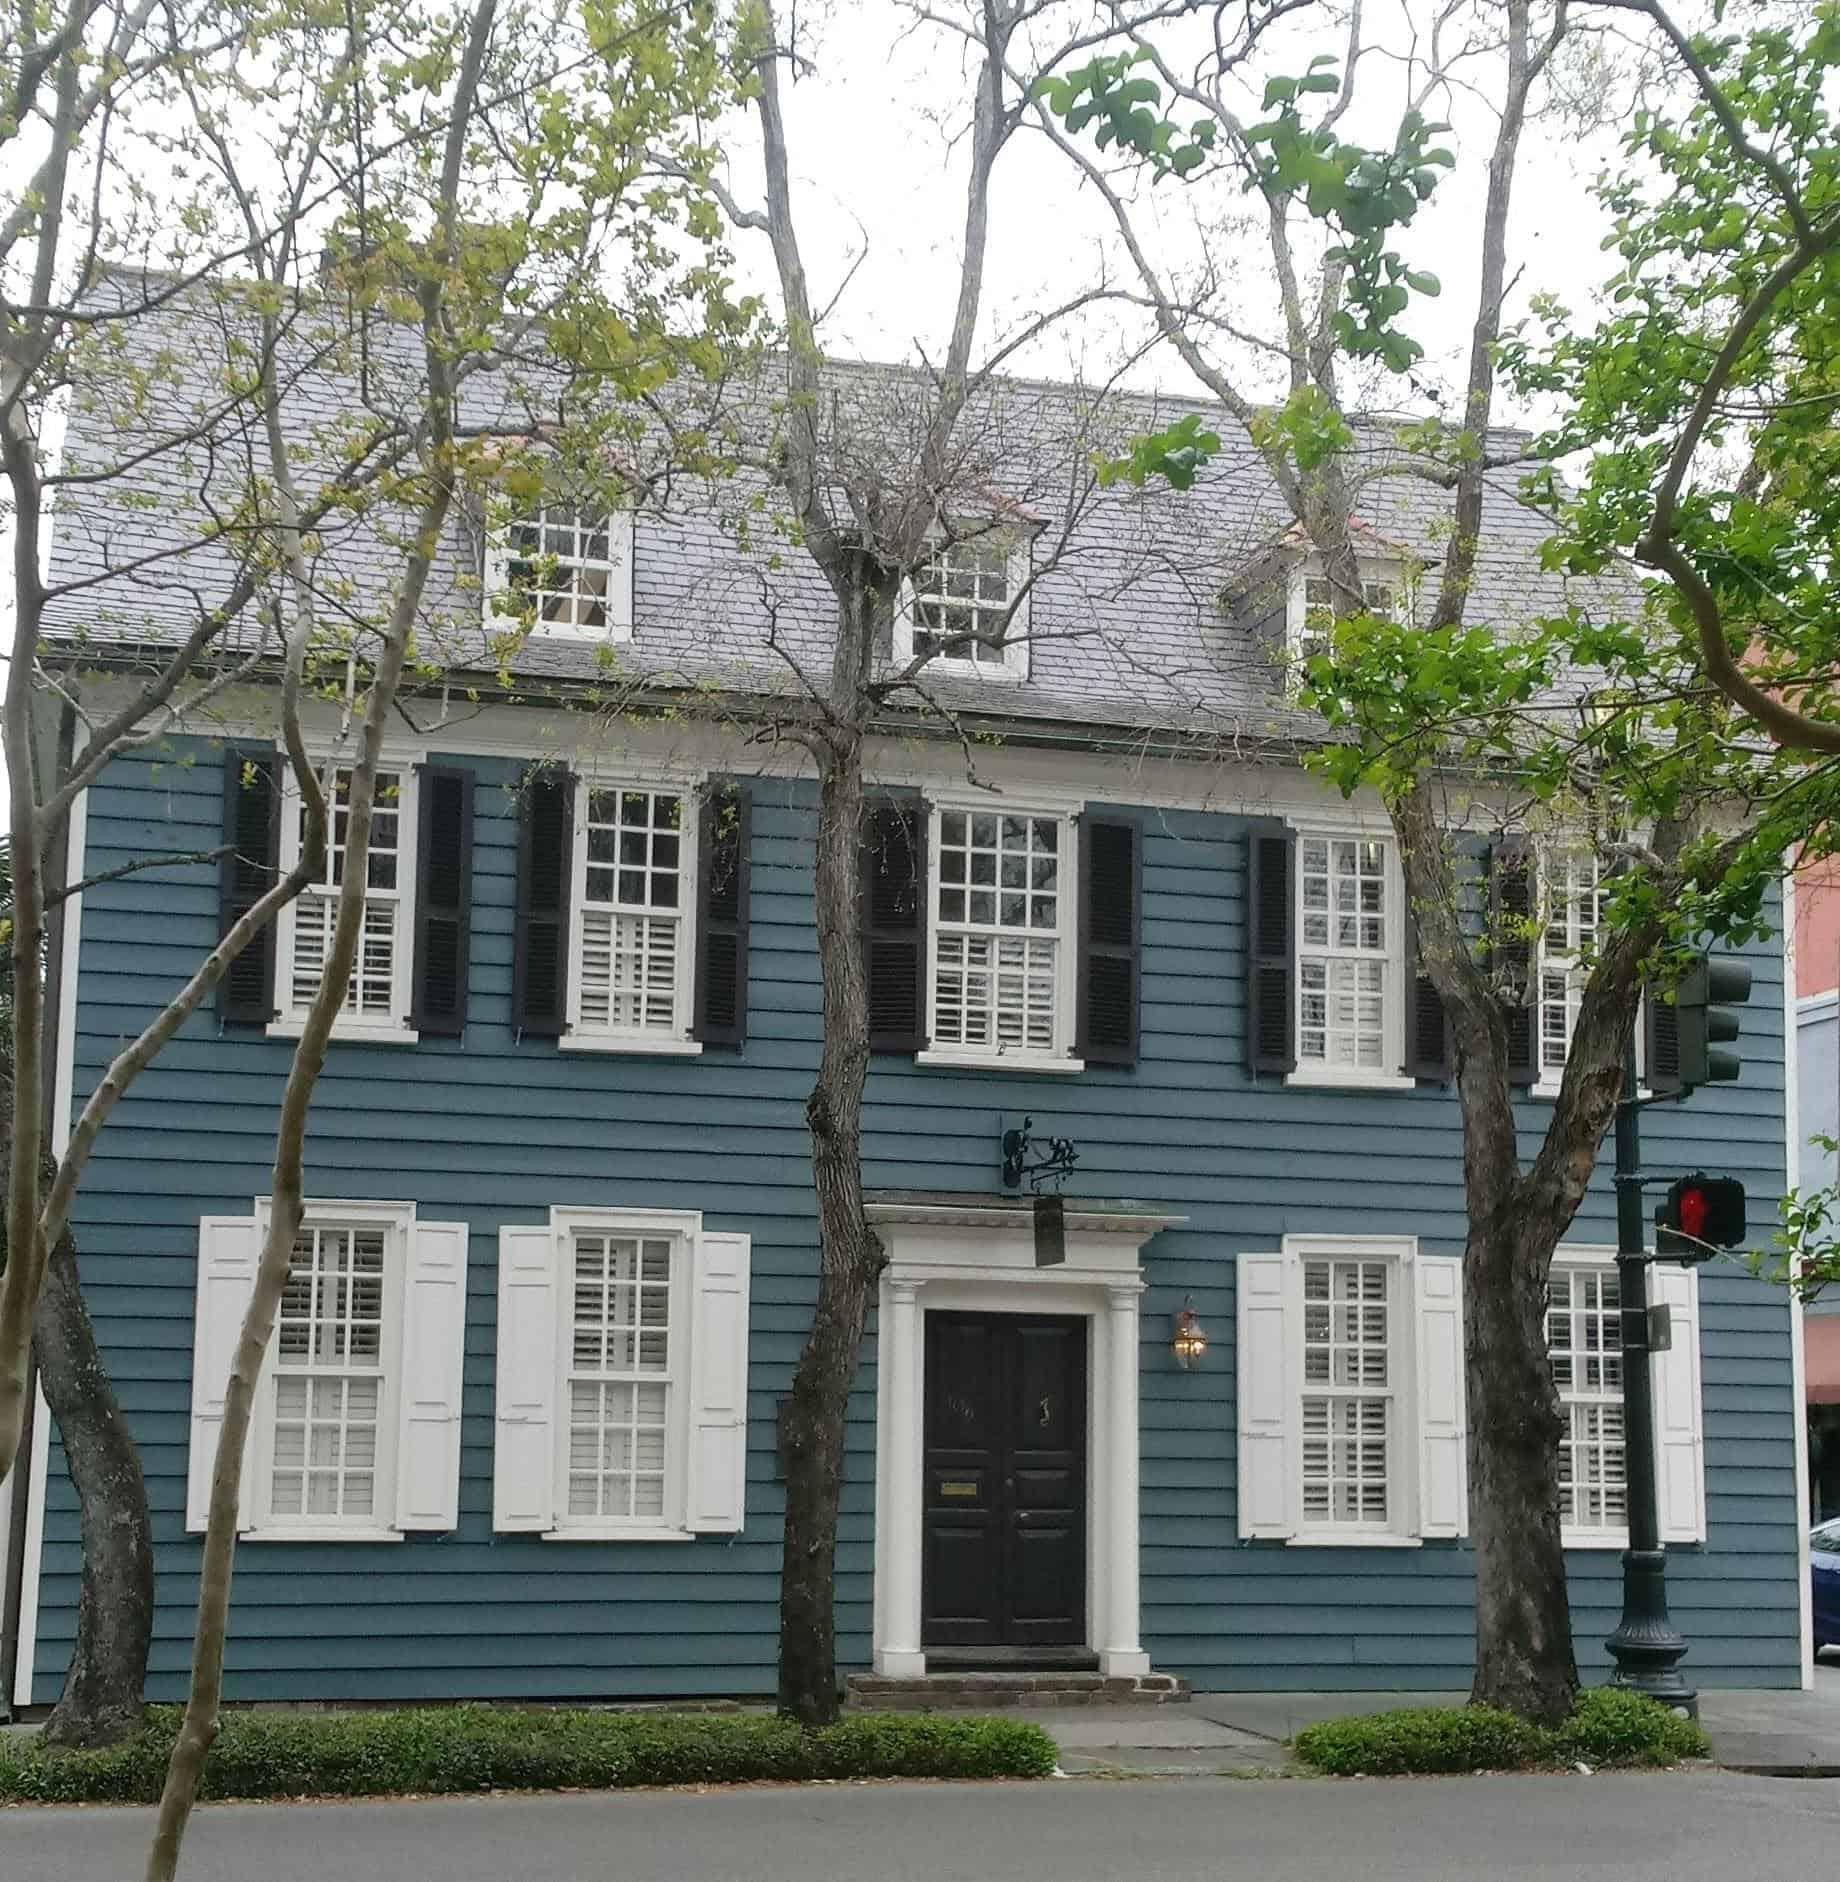 ColonialCharlestontour_ChelsyProper_Point19photo_johnlininghouse